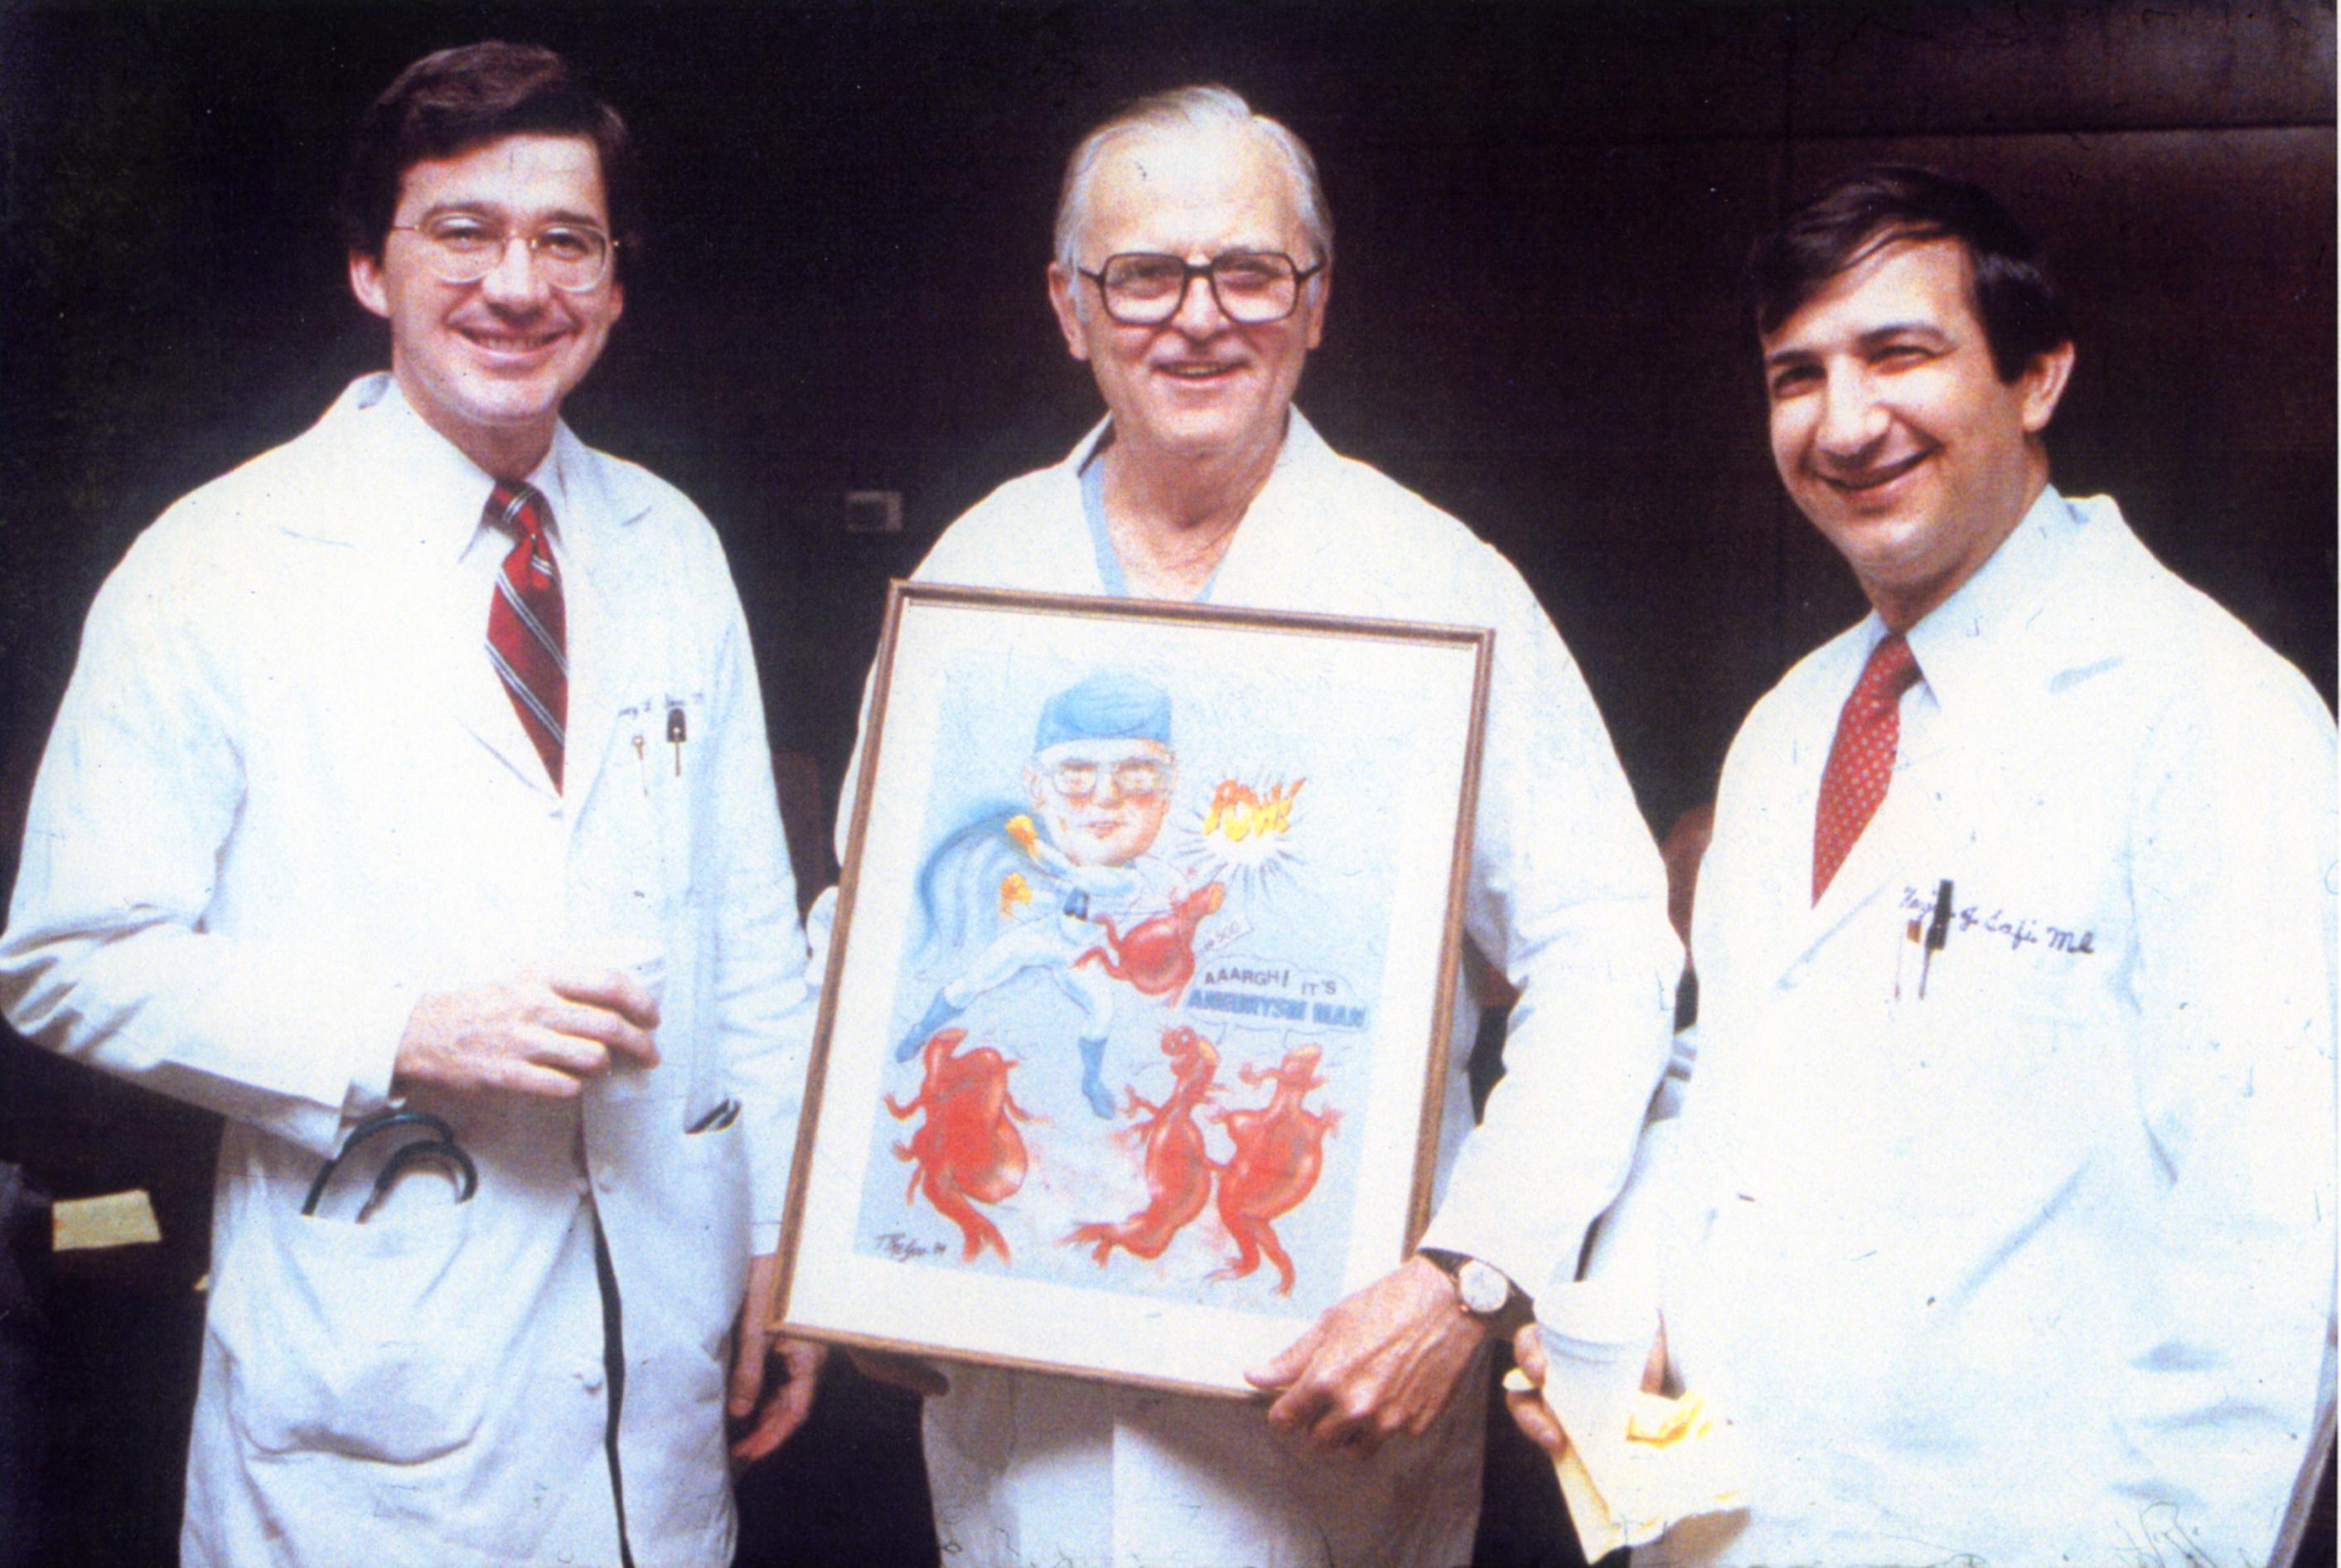 Drs. Stoe, Crawford, & Safi